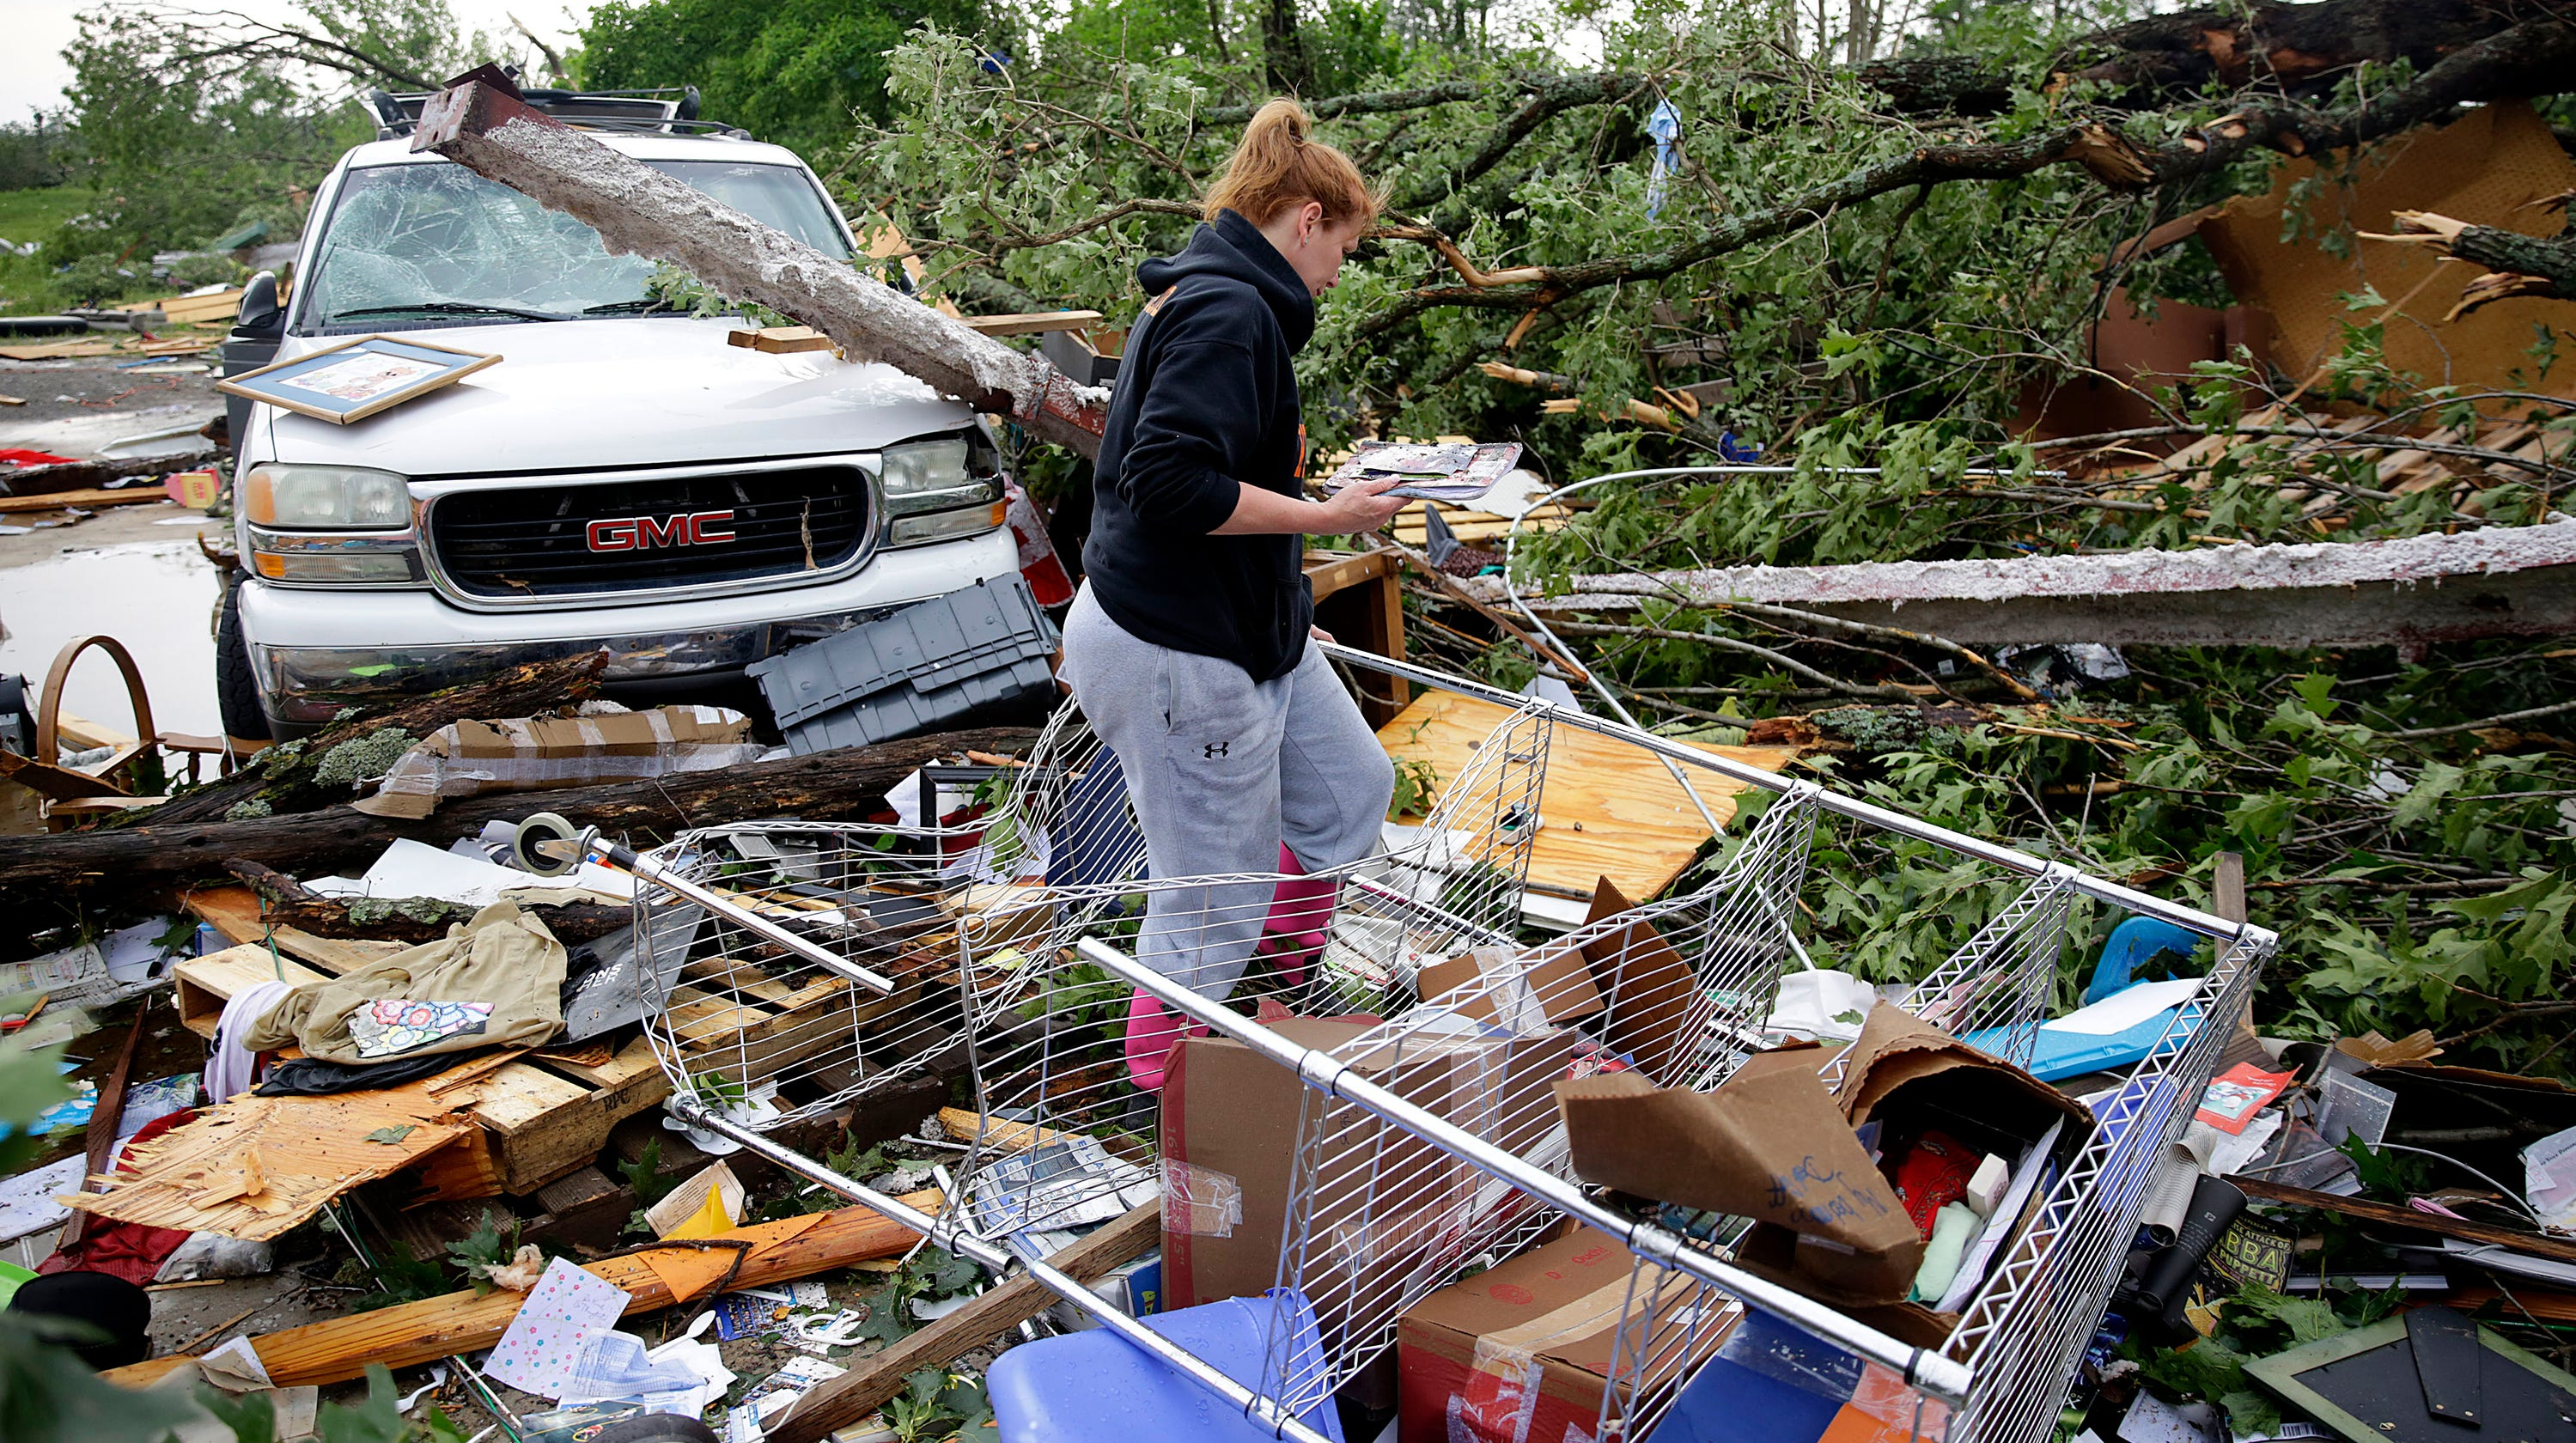 4 dead as killer tornadoes, floods slam Central US